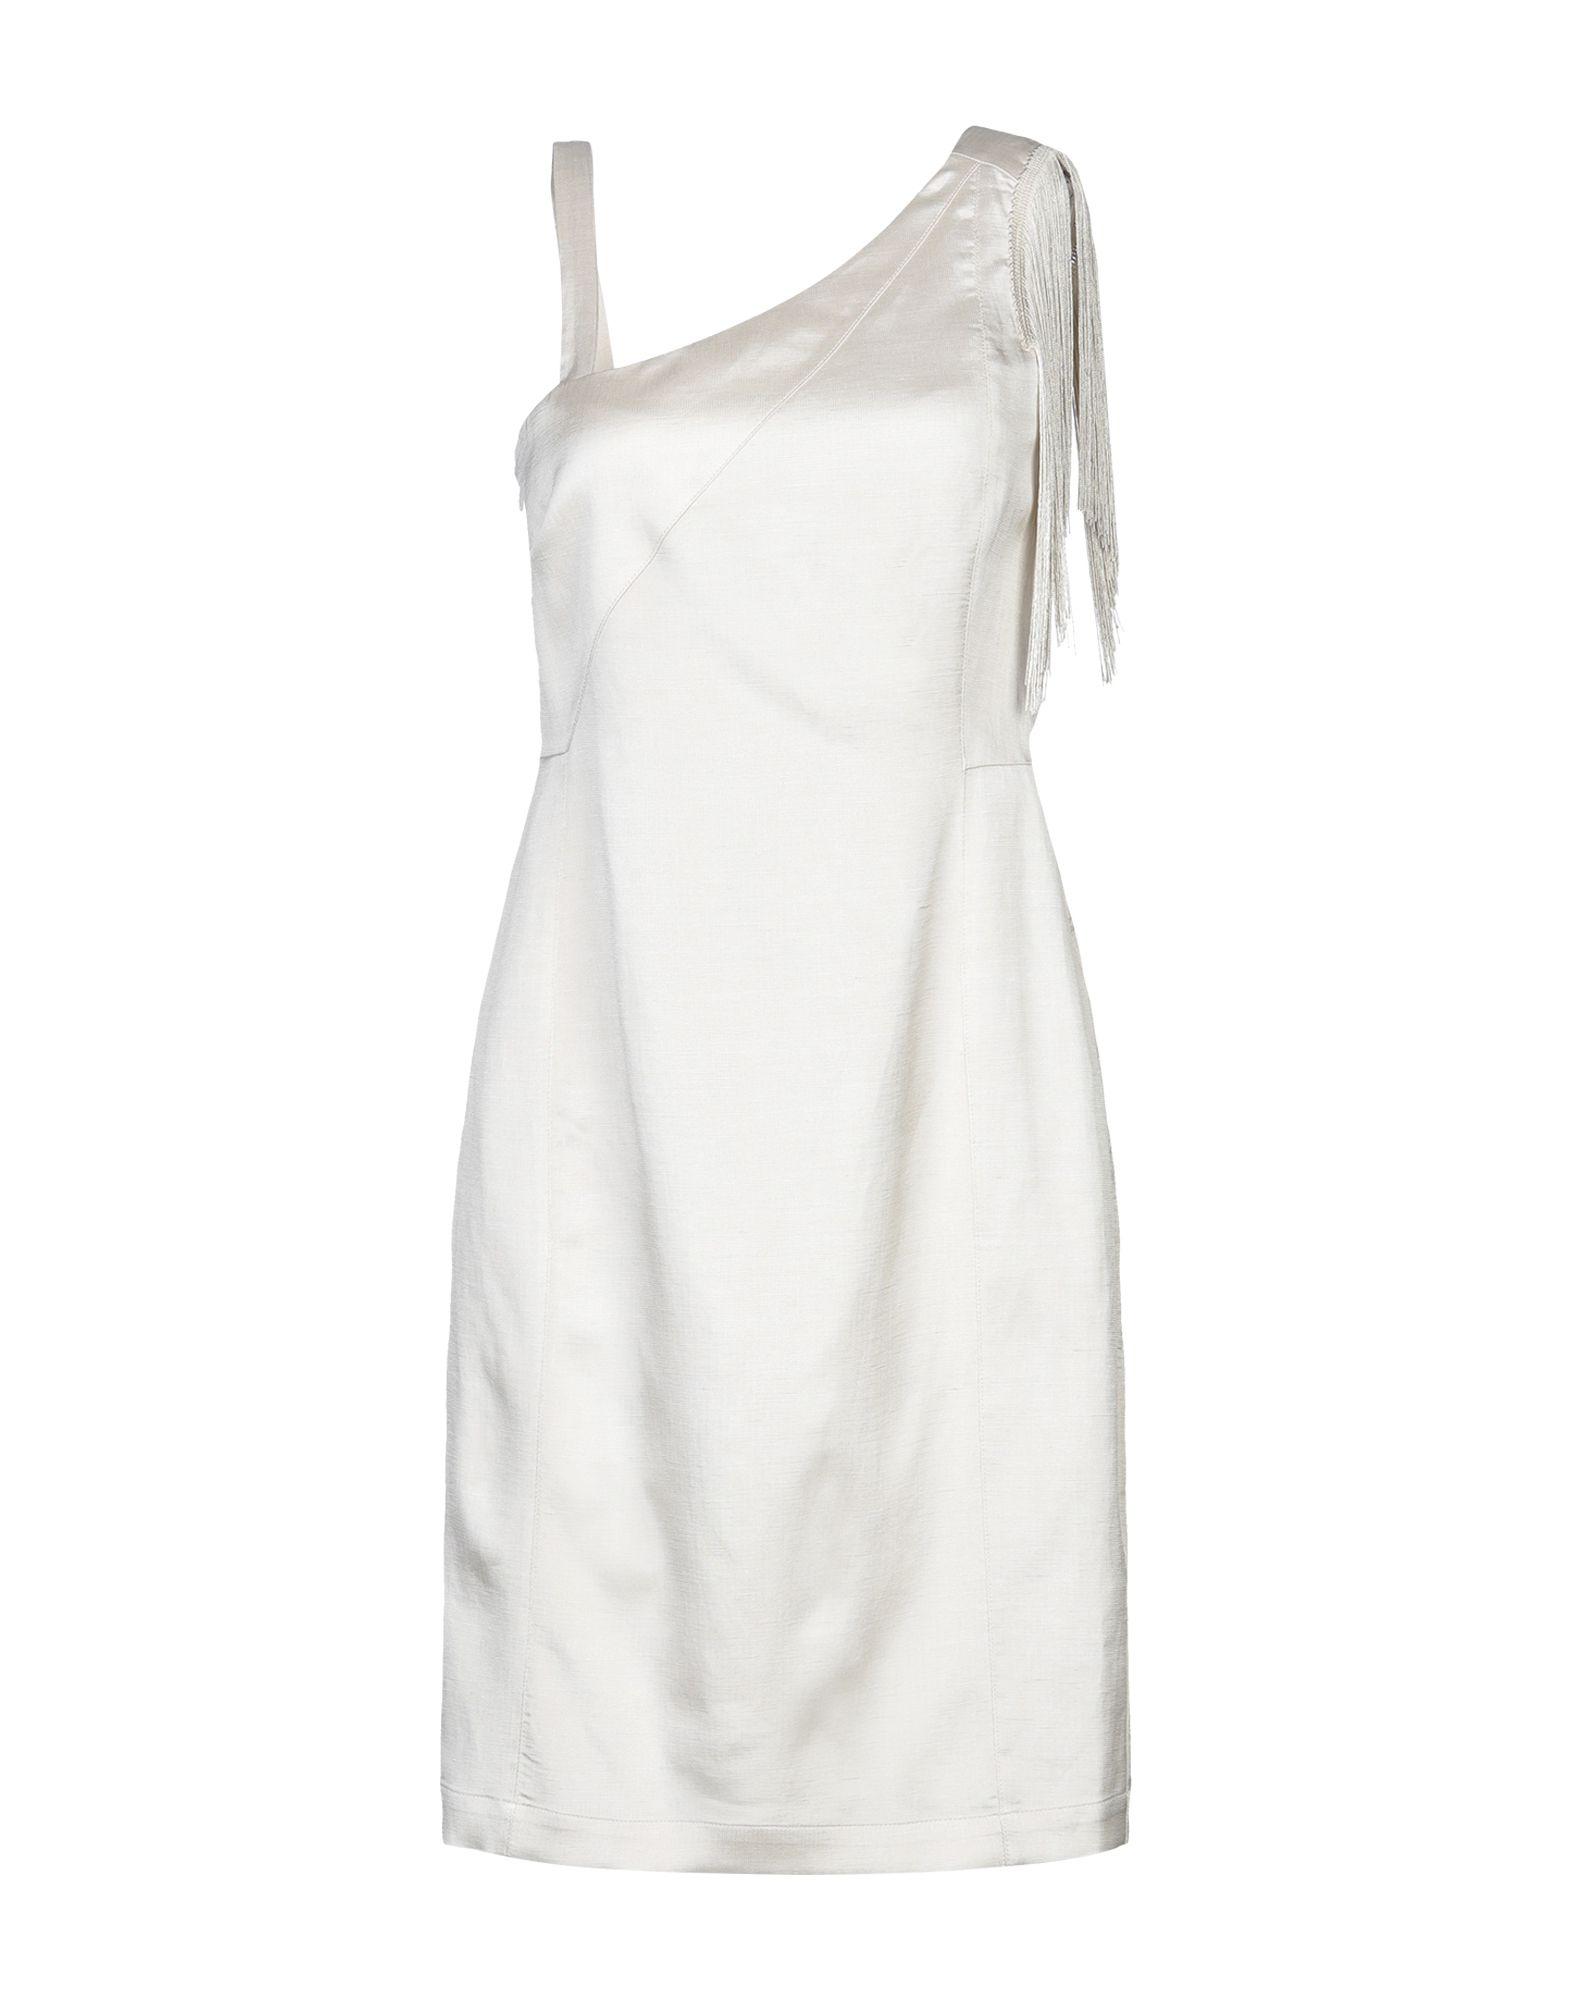 MARIELLA ROSATI Короткое платье mariella rosati mariella rosati платье 174080 page 5